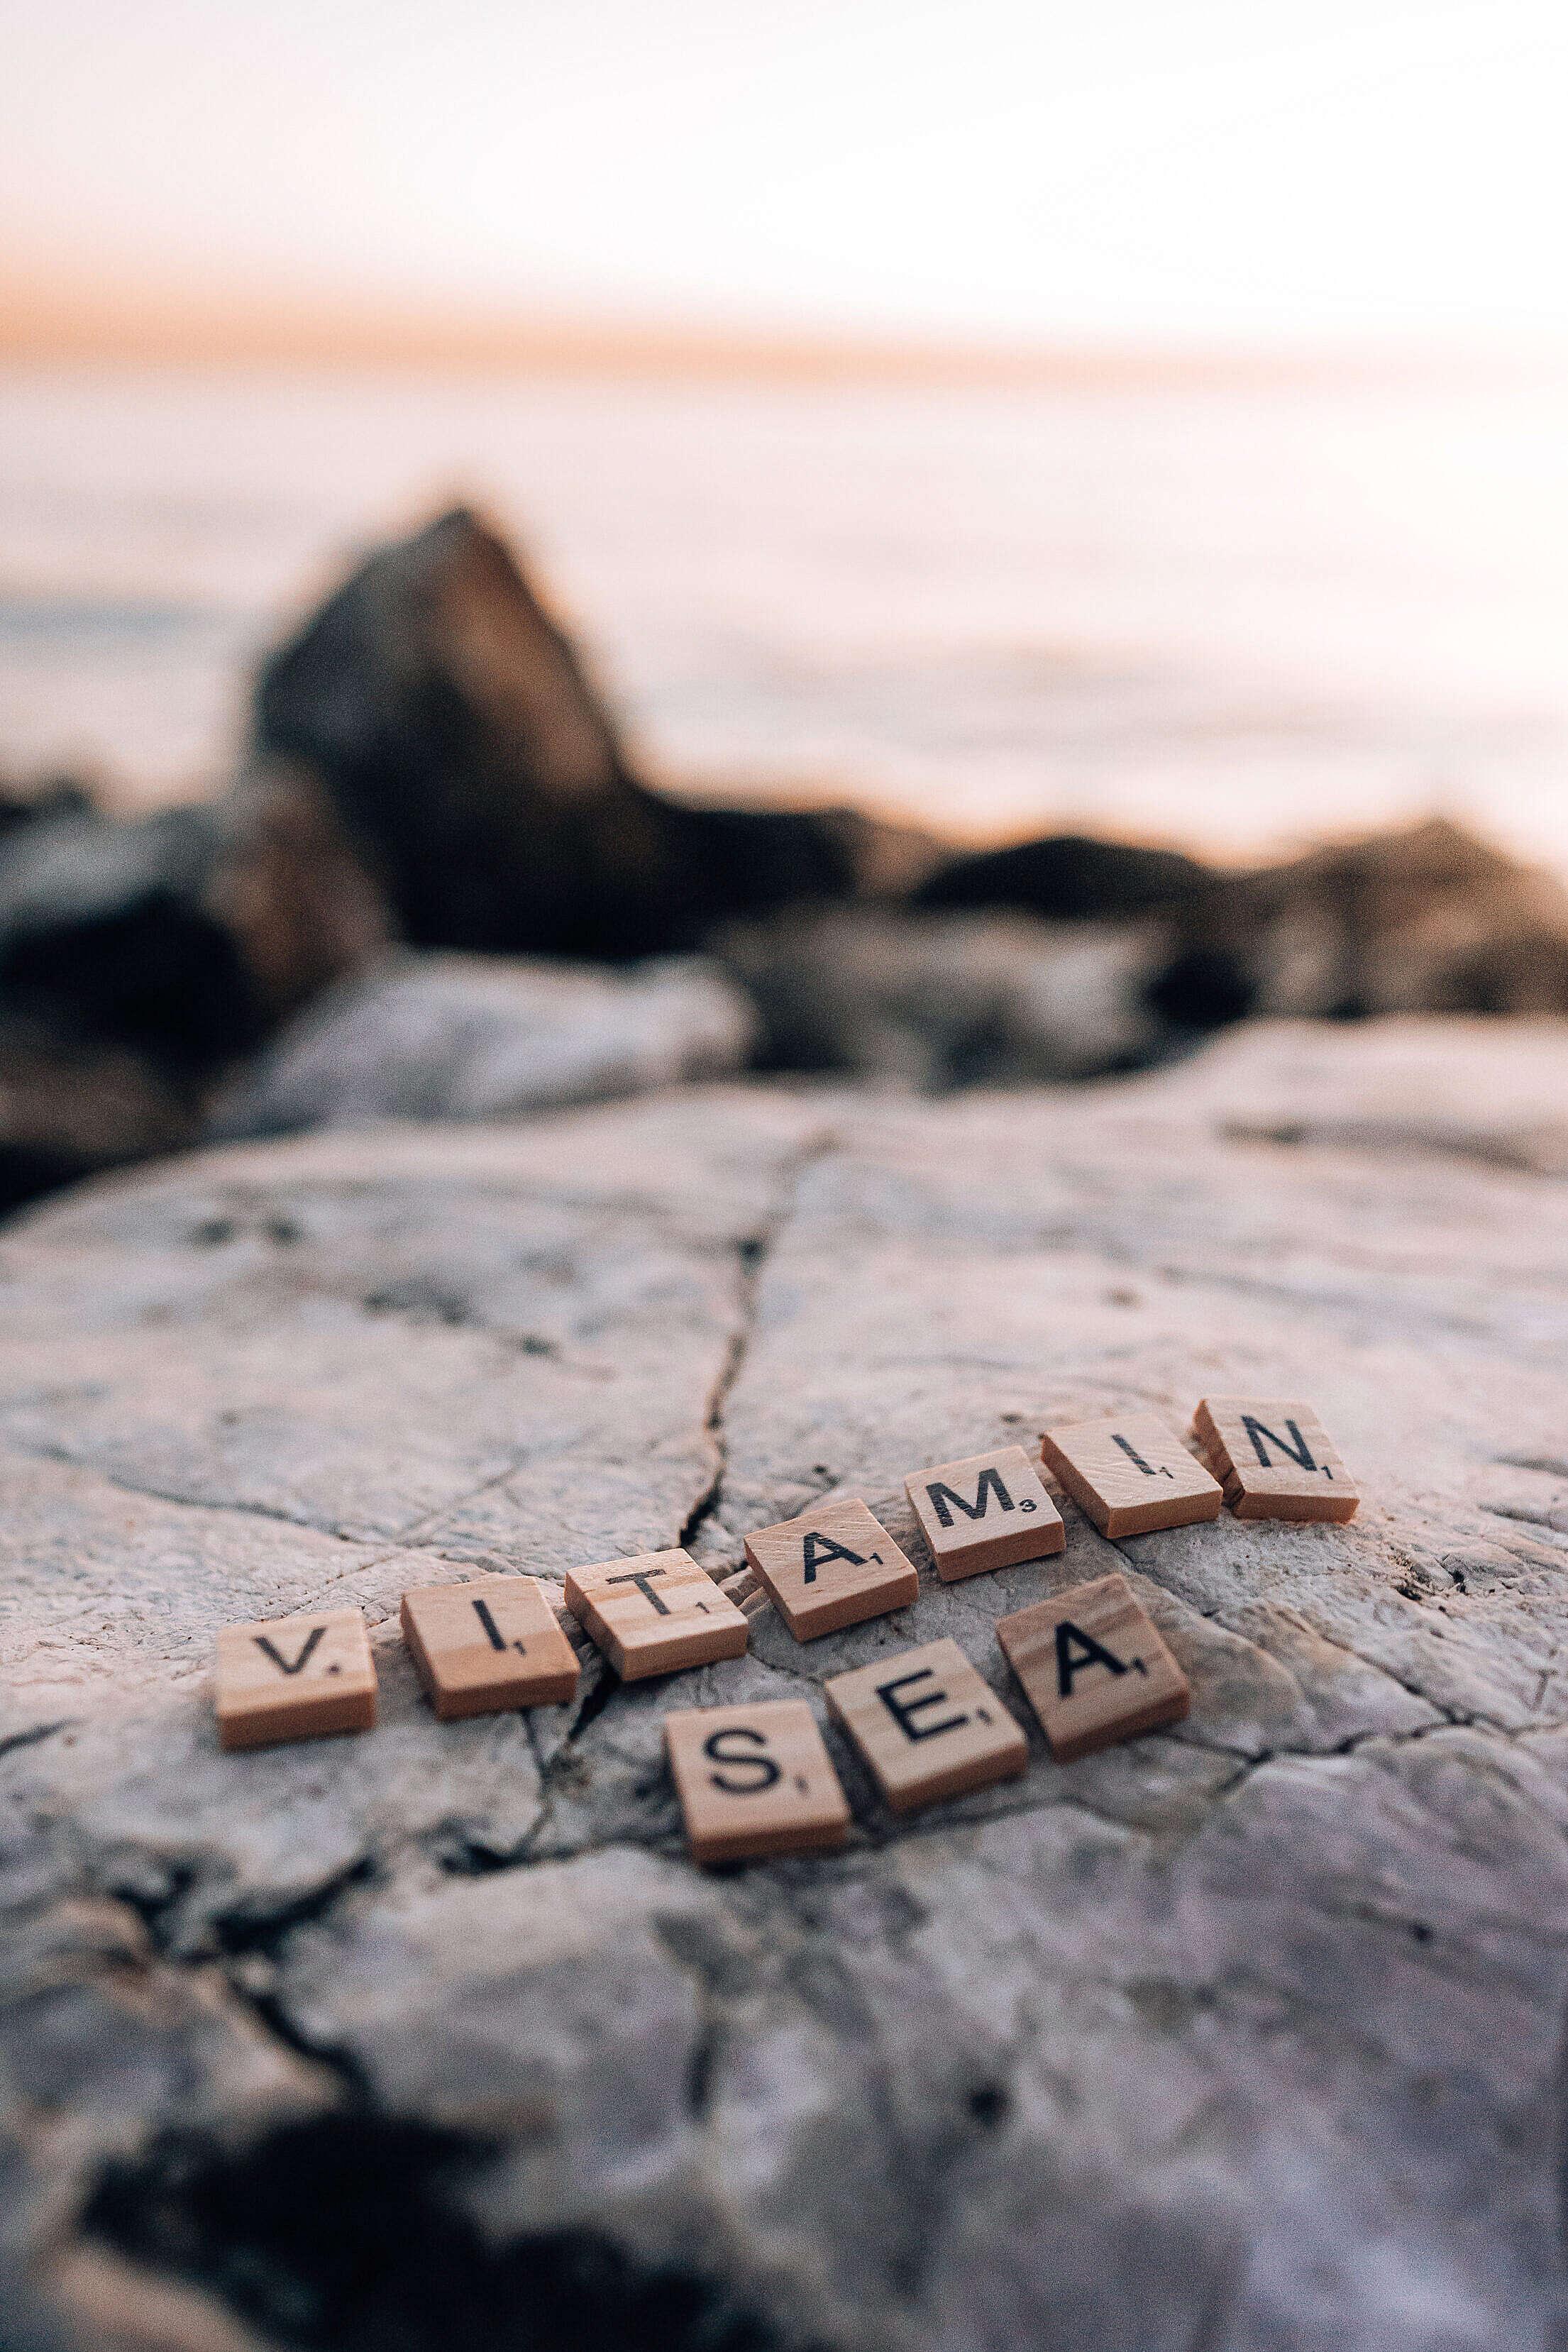 Vitamin Sea Scrabble Tiles Lettering Free Stock Photo